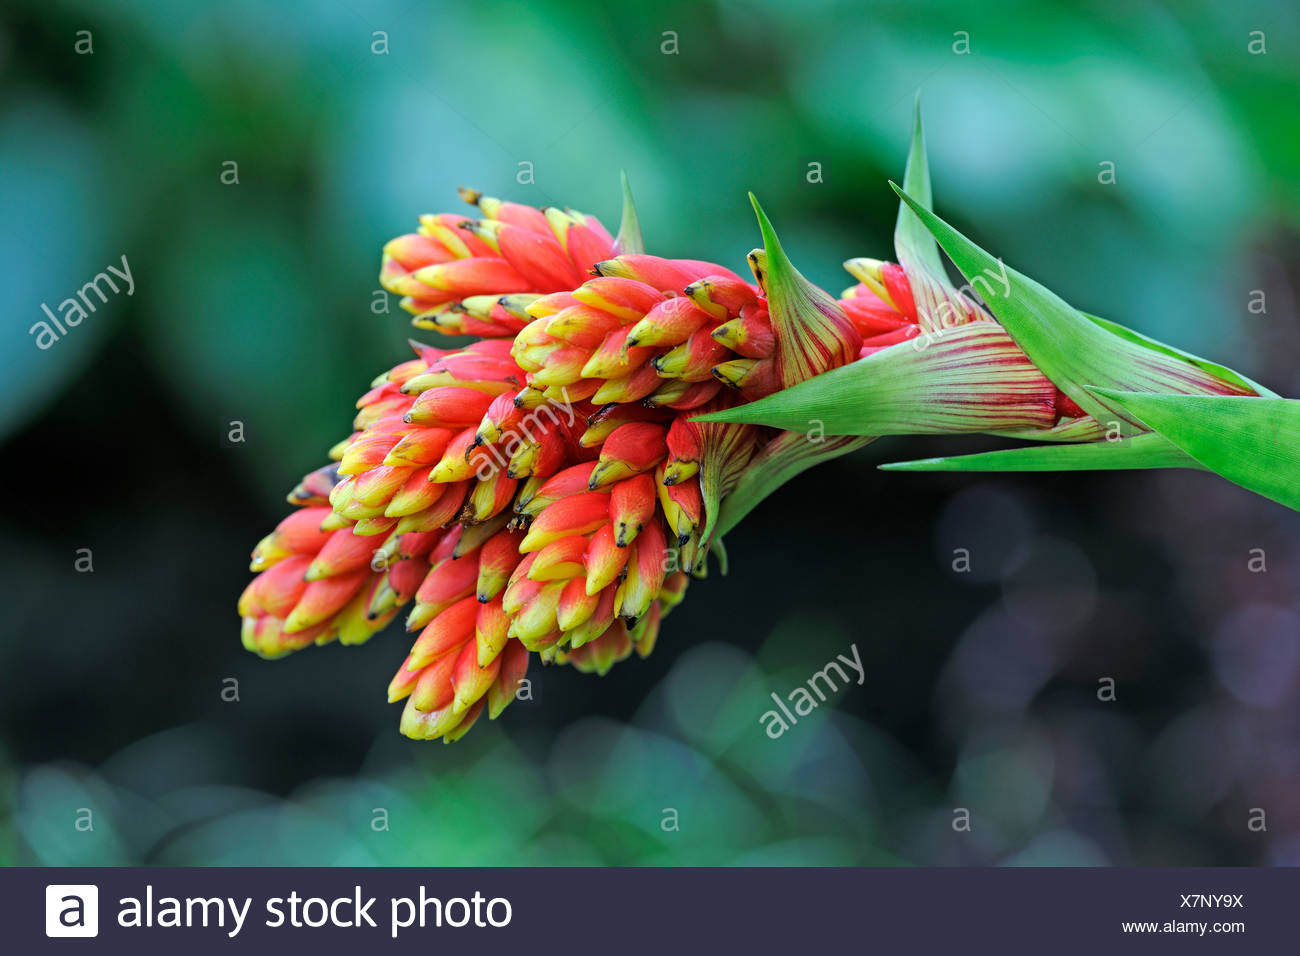 Reddish-yellow Guzmania (Guzmania rubrolutea), Ecuador - Stock Image